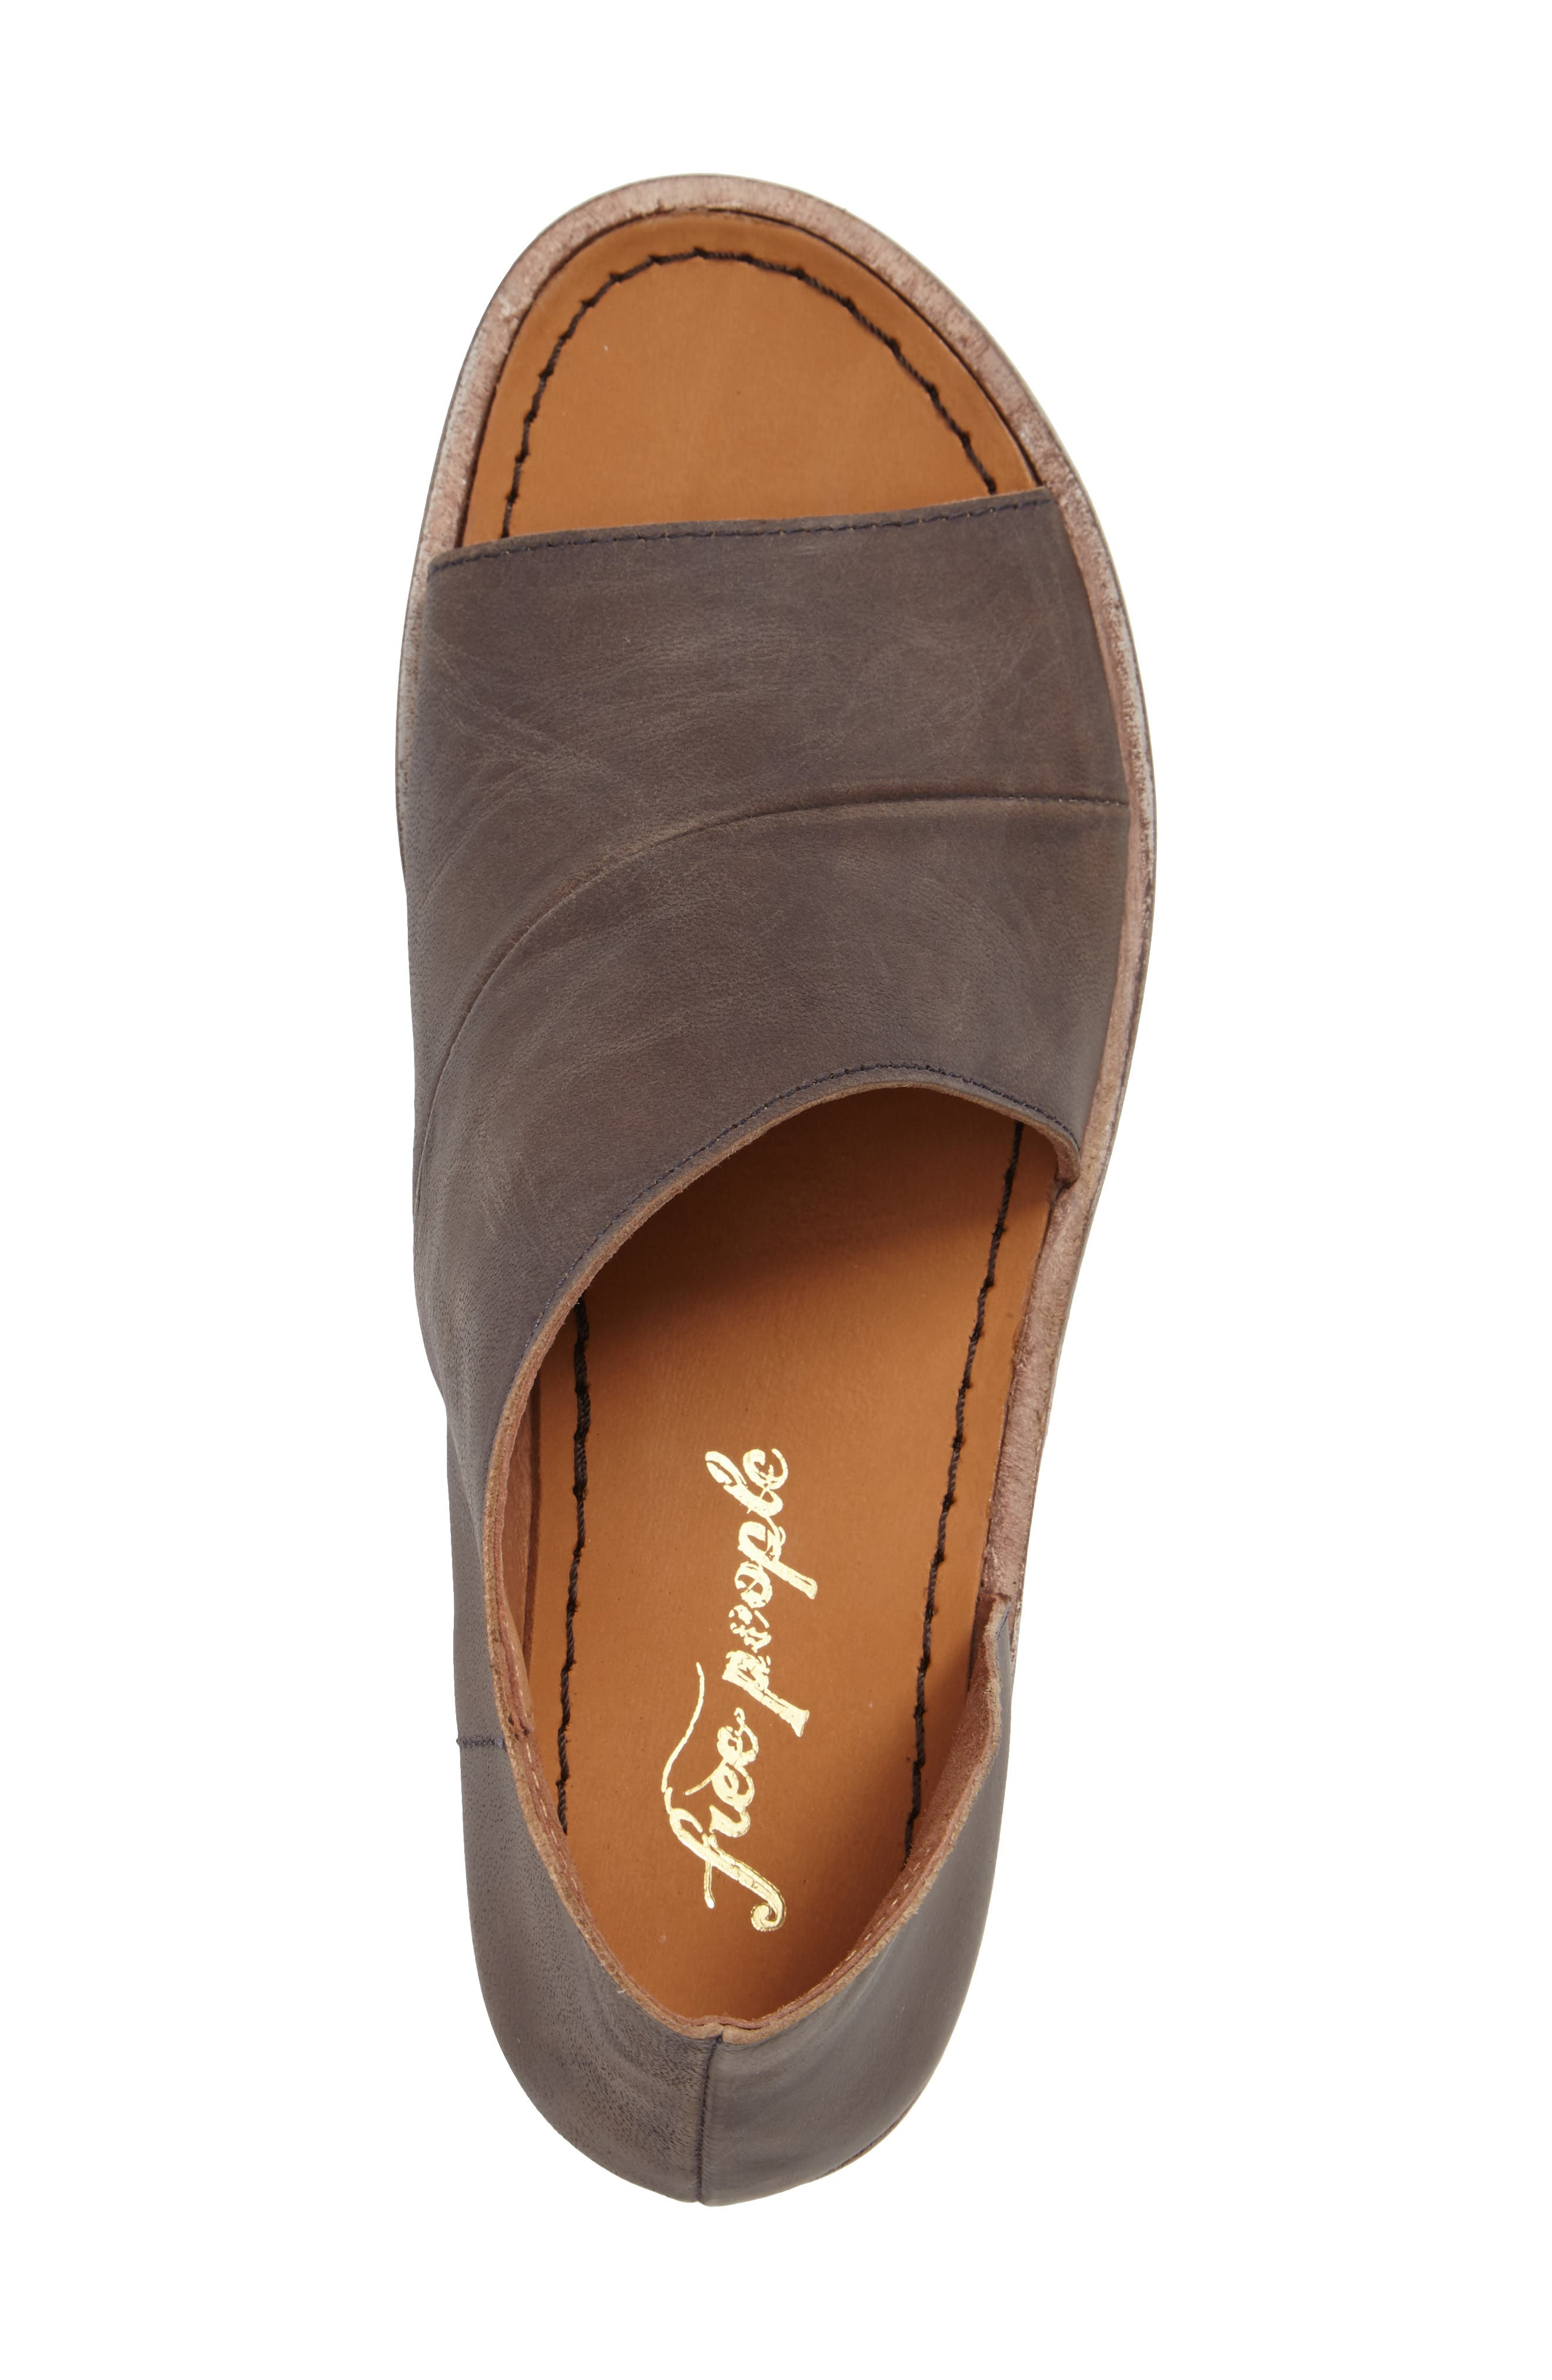 'Mont Blanc' Asymmetrical Sandal,                             Alternate thumbnail 36, color,